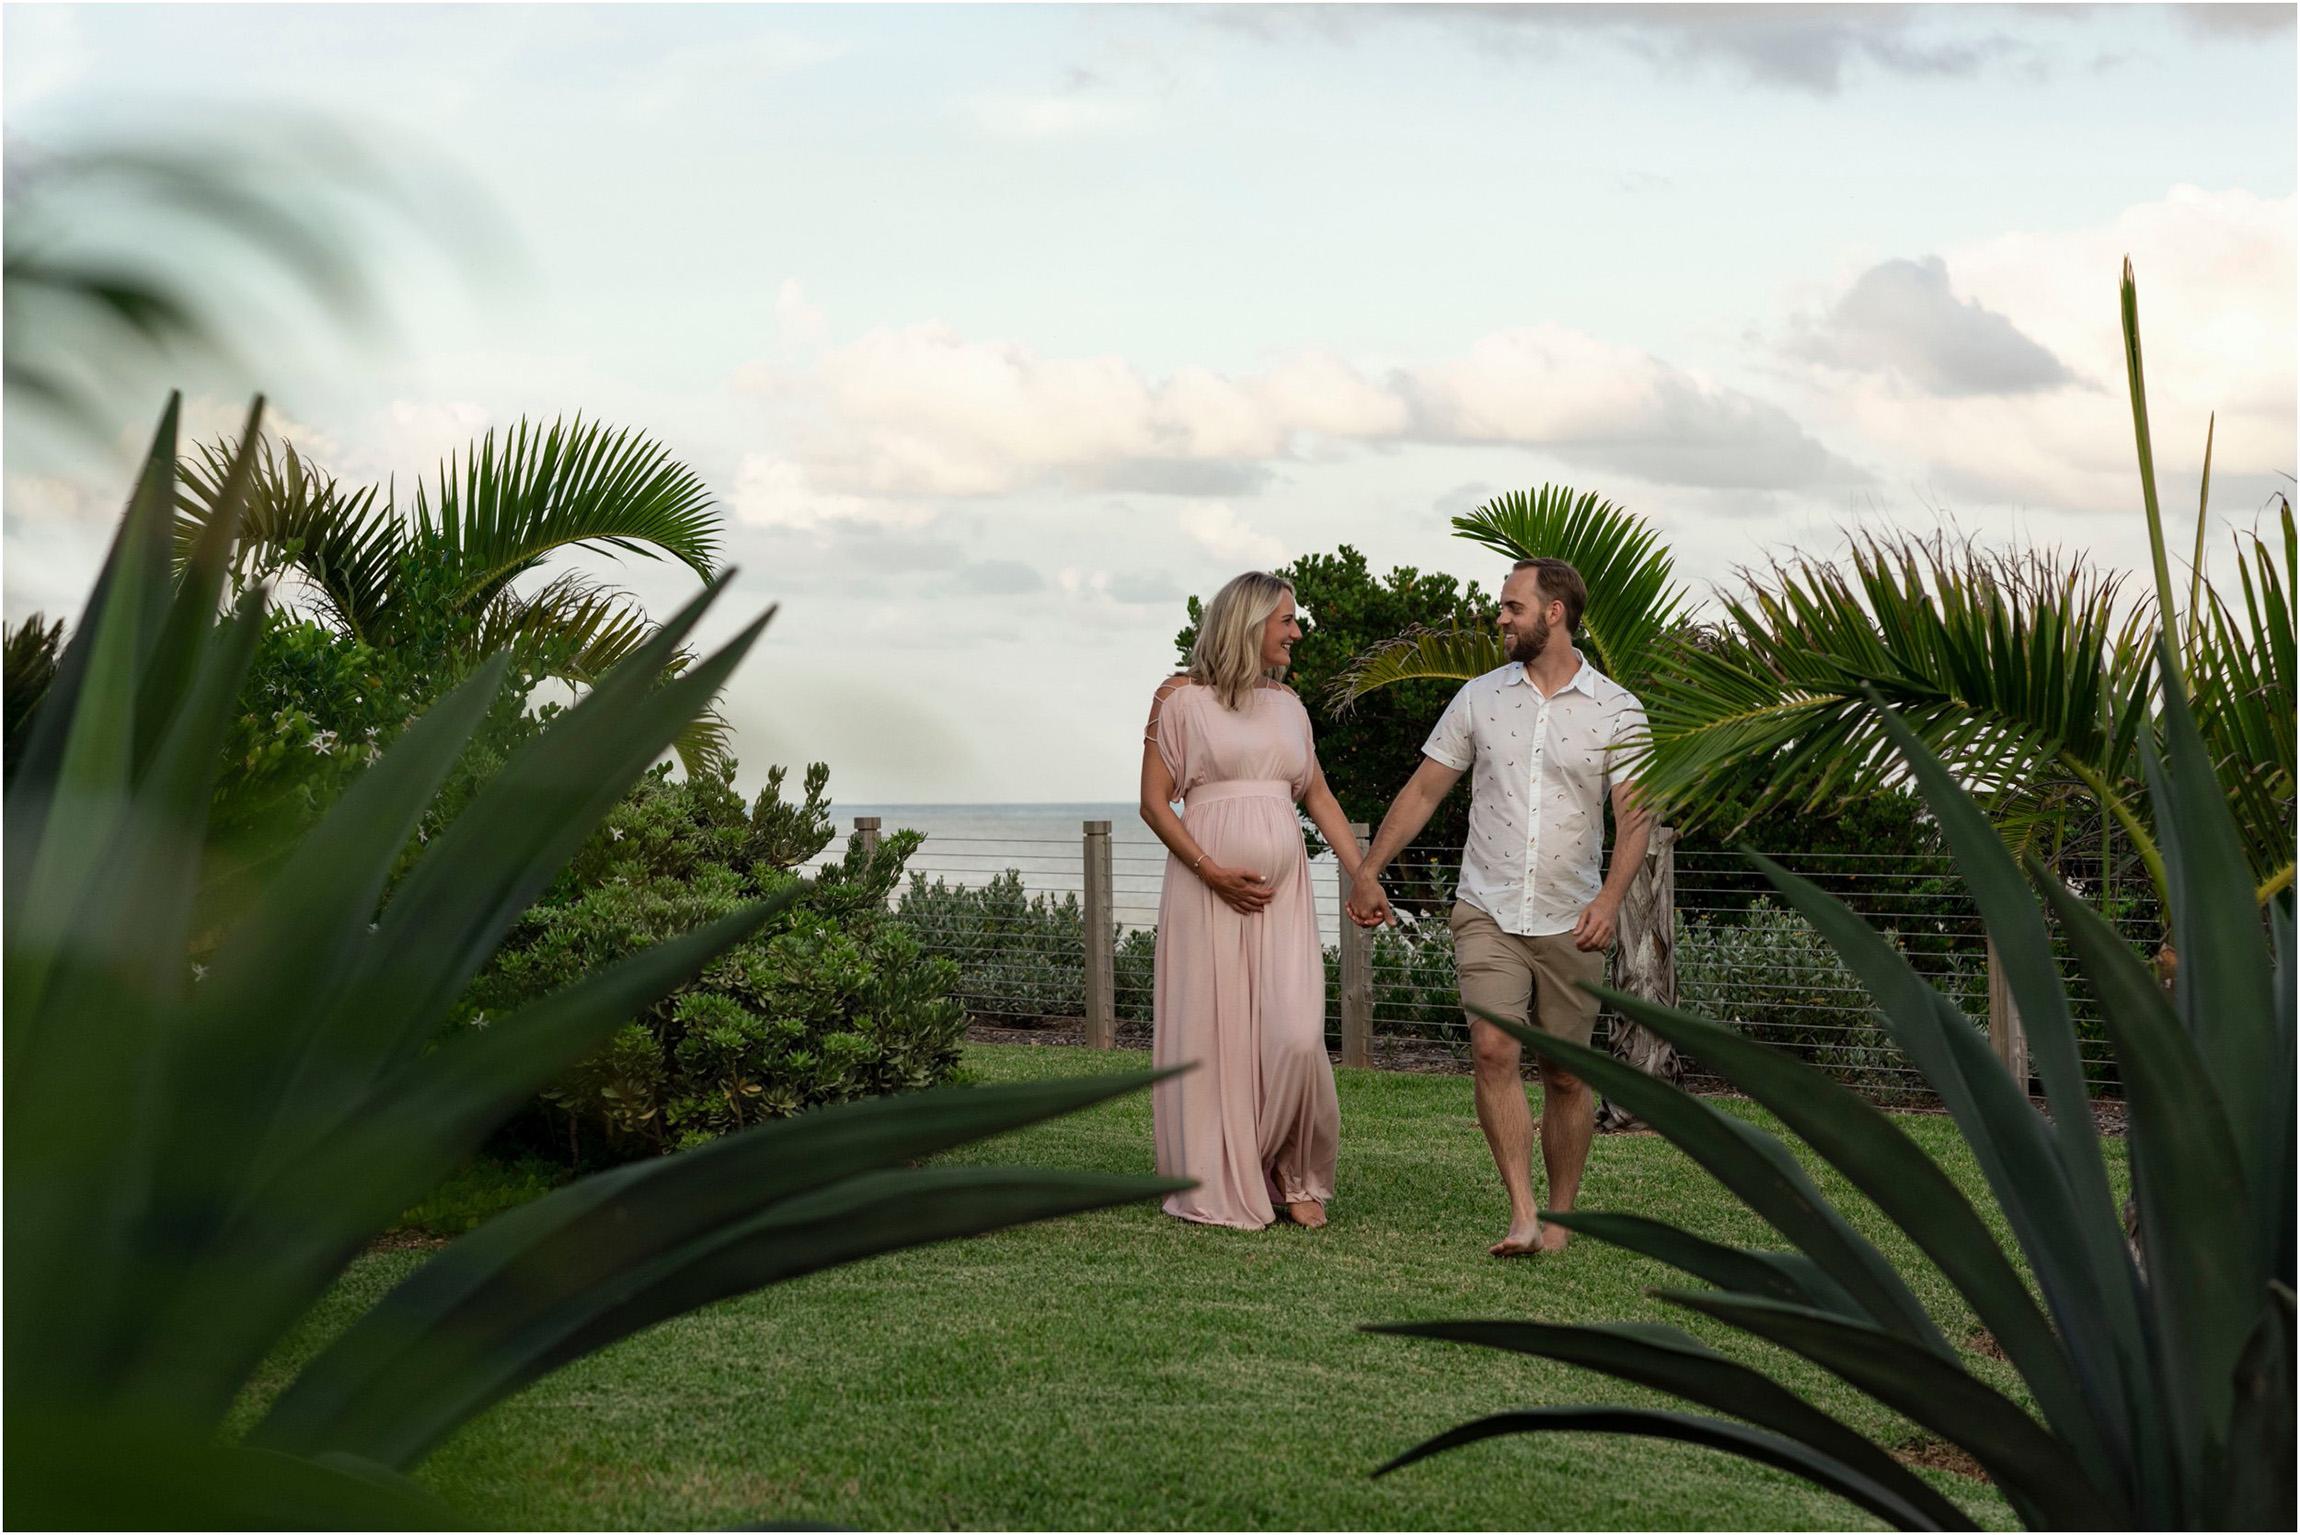 ©FianderFoto_Bermuda_Tom Moore's Jungle_Proposal Maternity Photographer_Erika_Andy_030.jpg